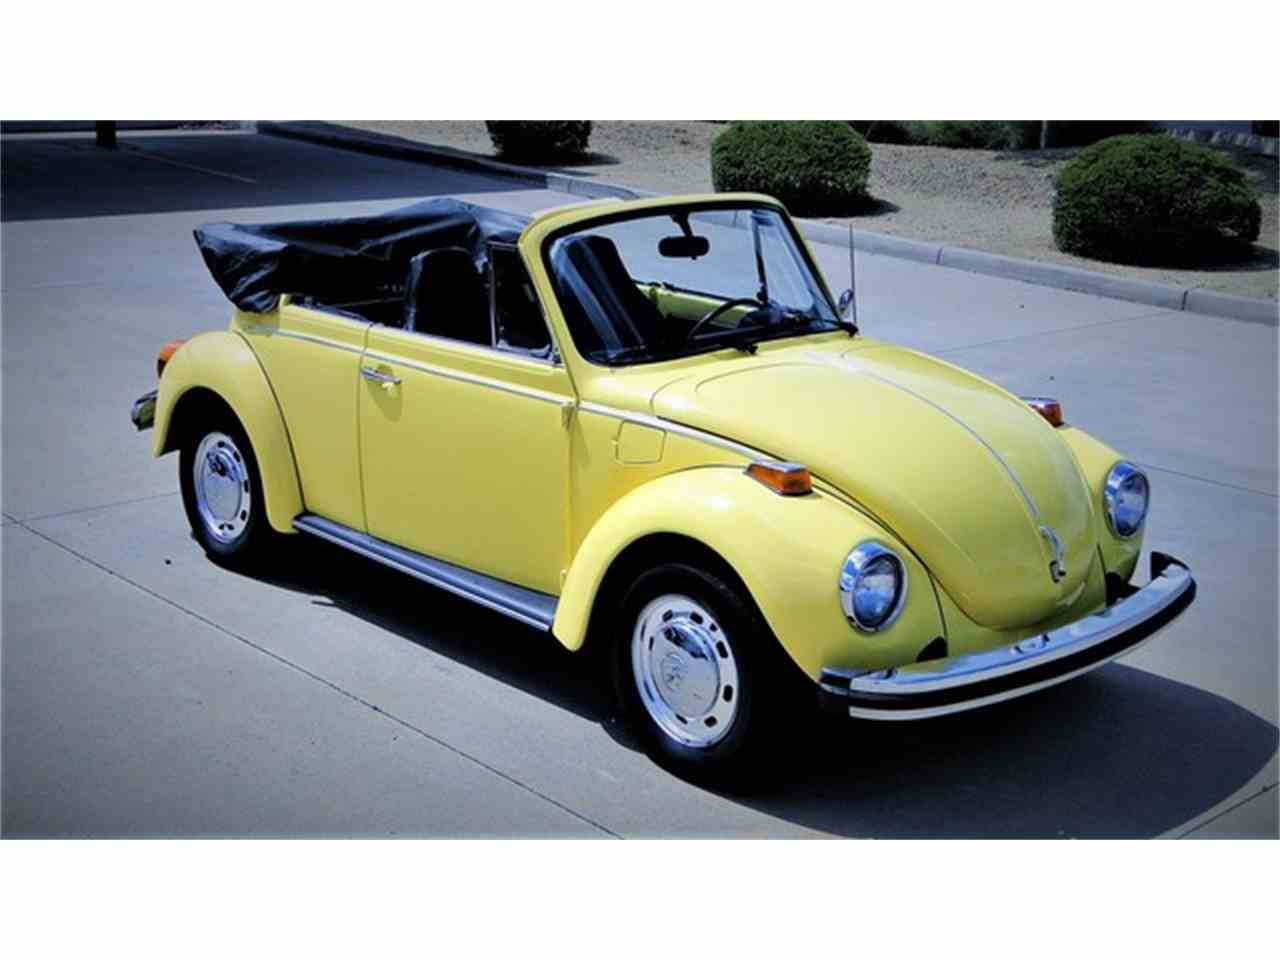 1974 Volkswagen Super Beetle Convertible For Sale Classiccars Com Cc 983588